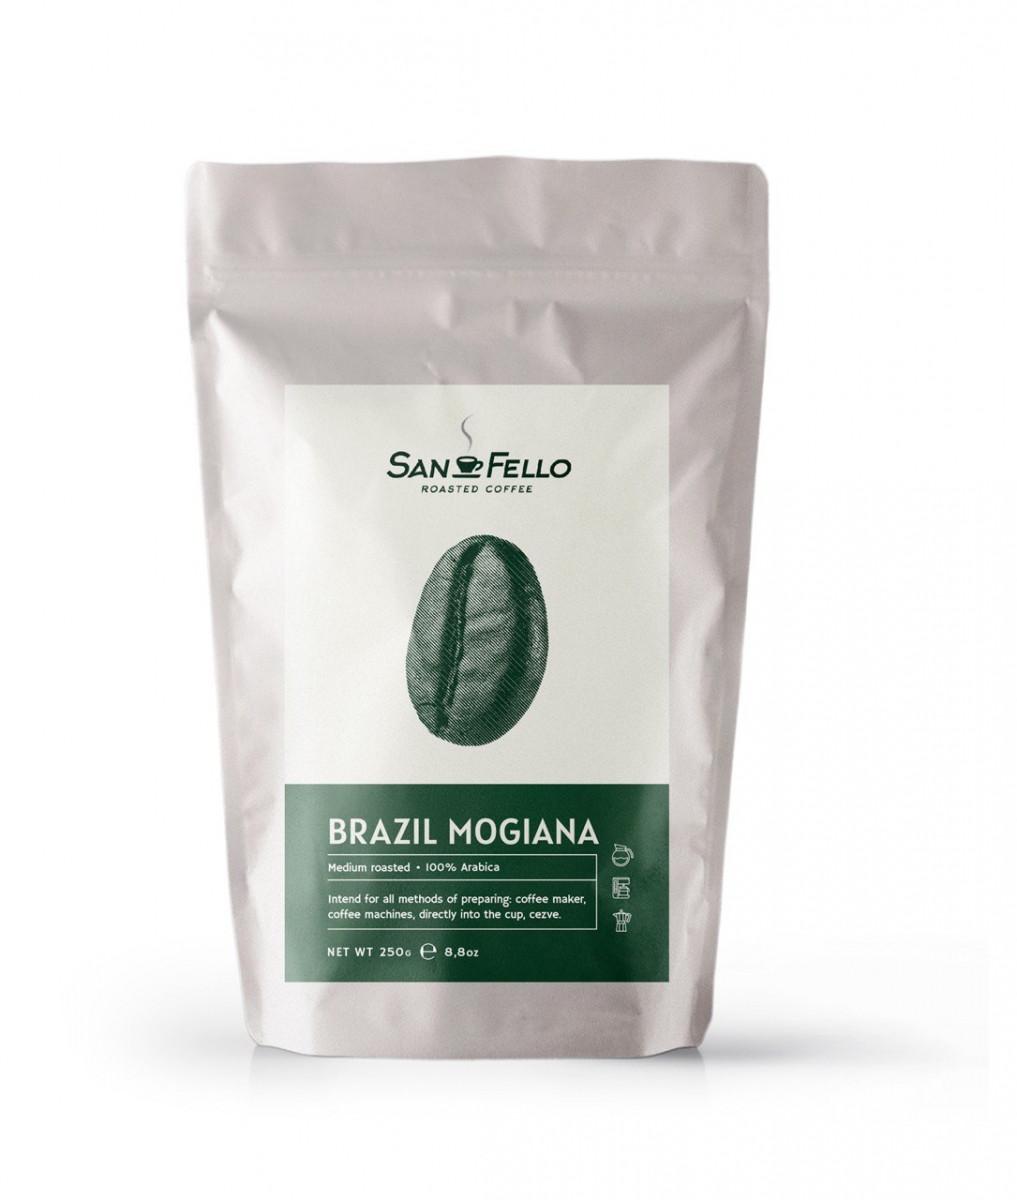 Арабика 100% Кофе в зернах свежая обжарка Brazil Mogiana 250 грамм